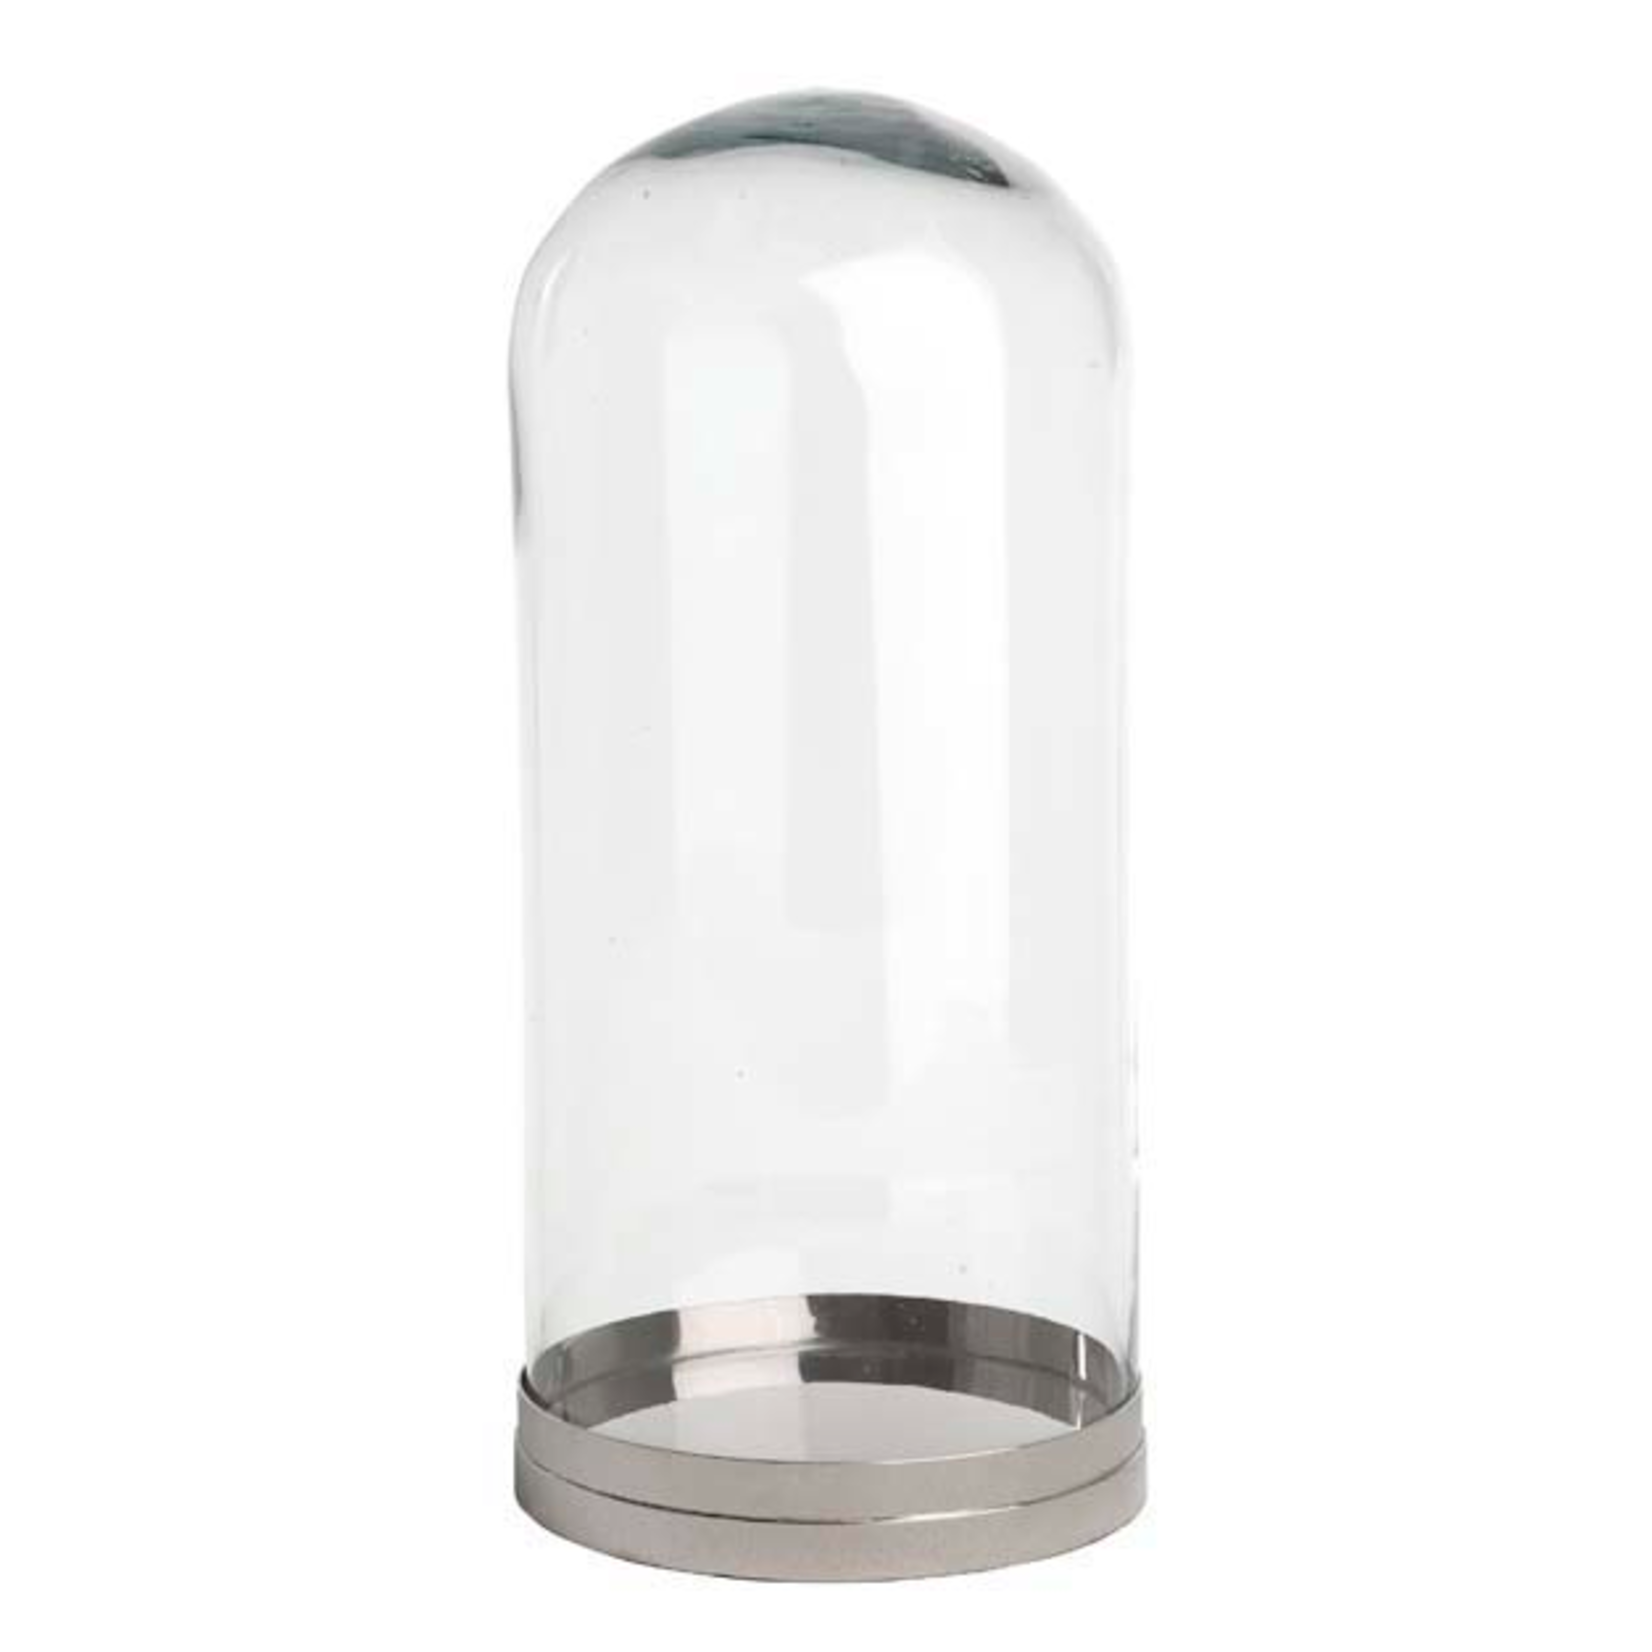 EICHHOLTZ BELL JAR NICKEL SMALL